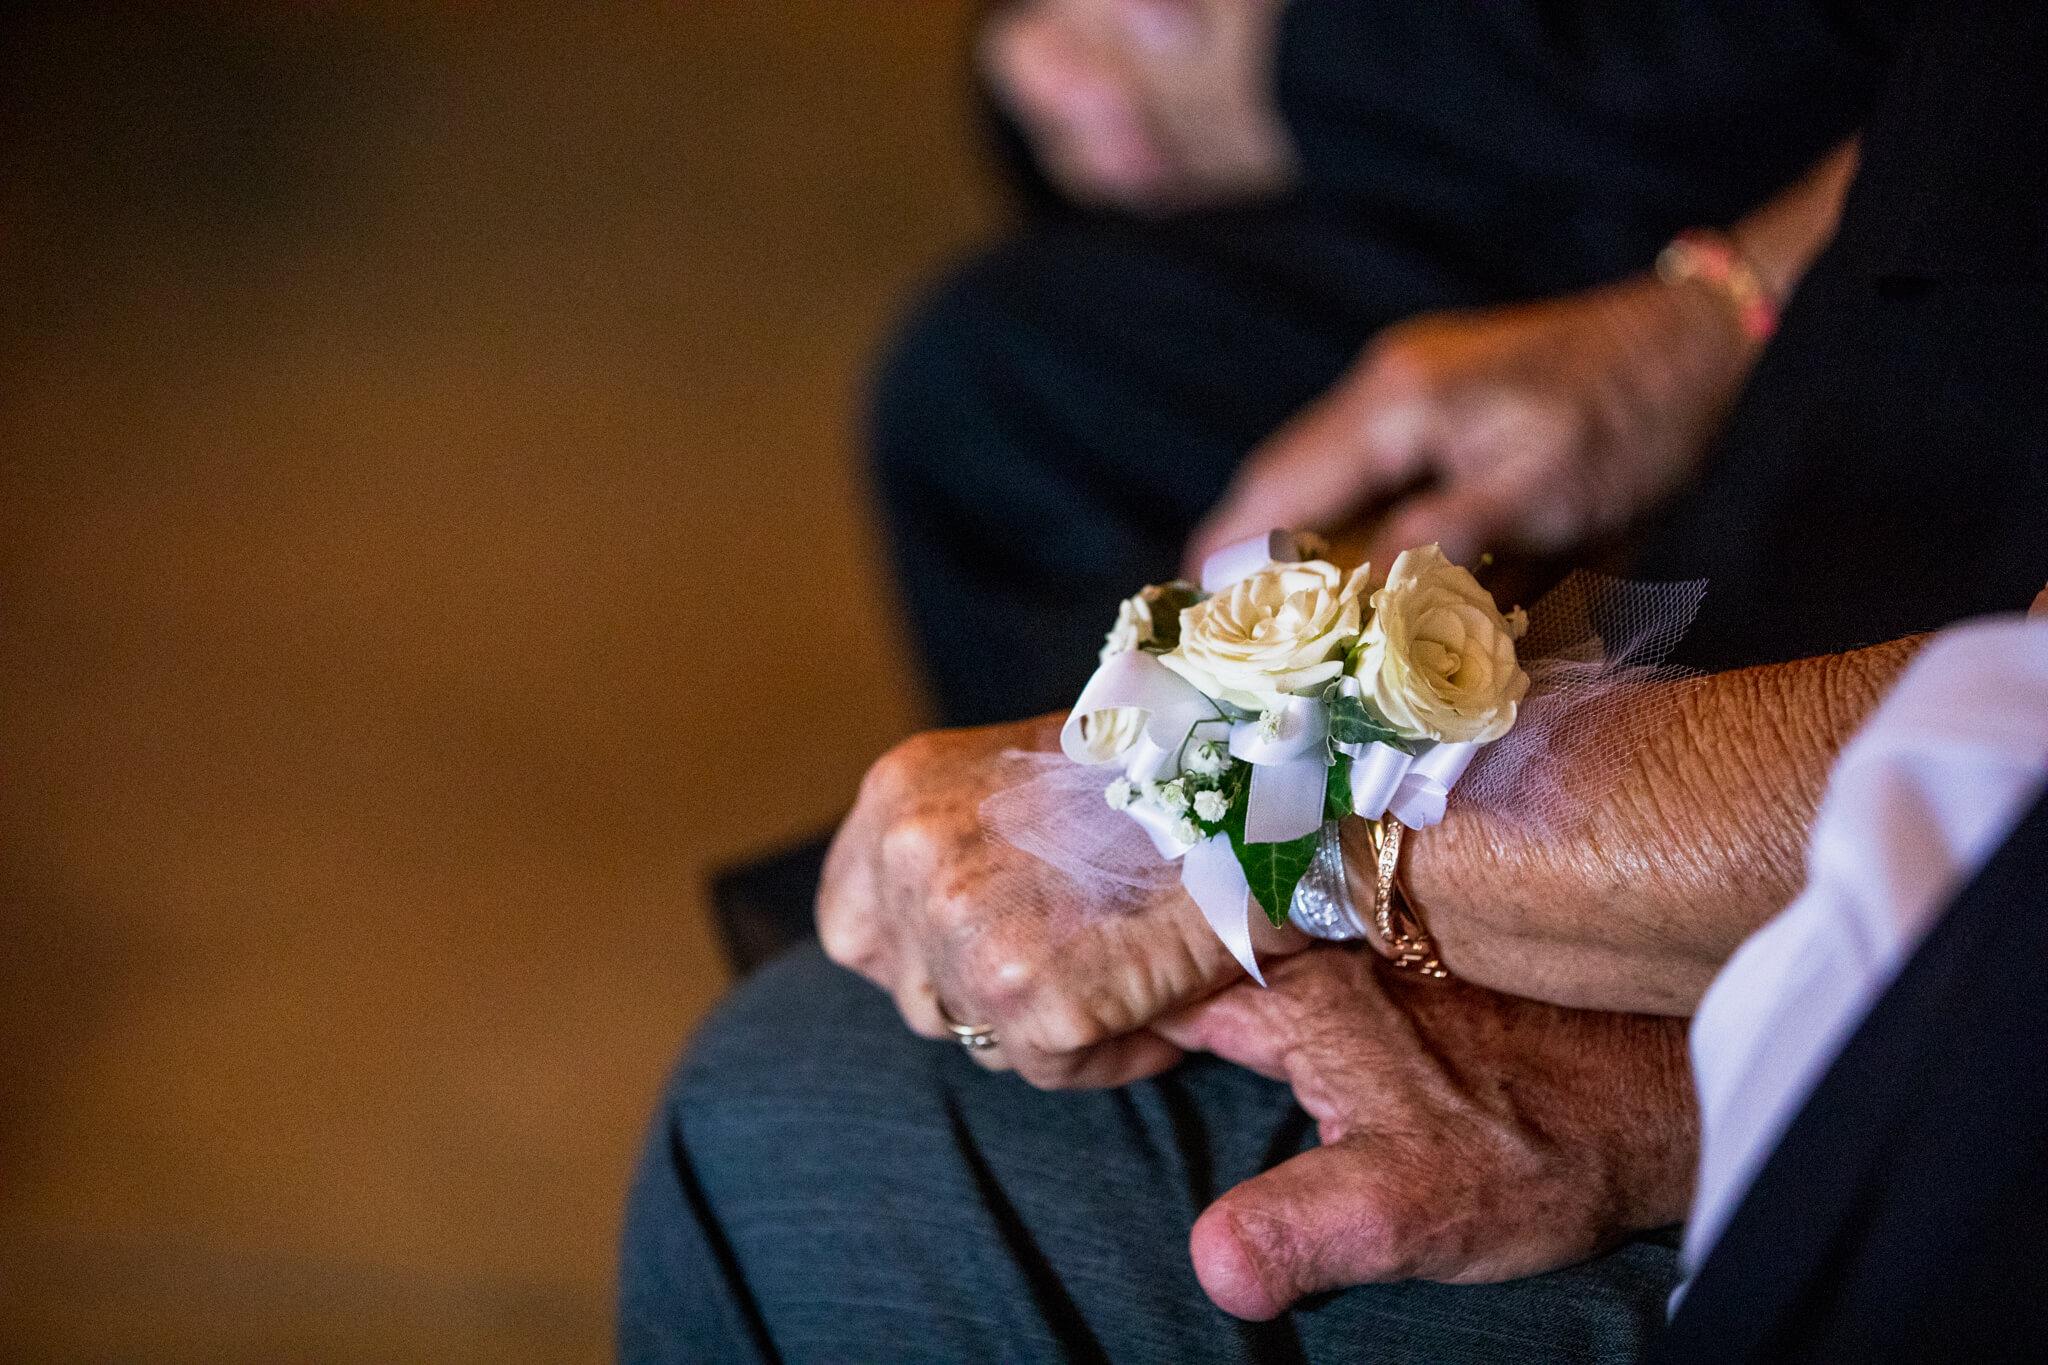 Alysia Jerad Homestead Blessings Farm Hershey PA Wedding Rustic Chique - 69.JPG